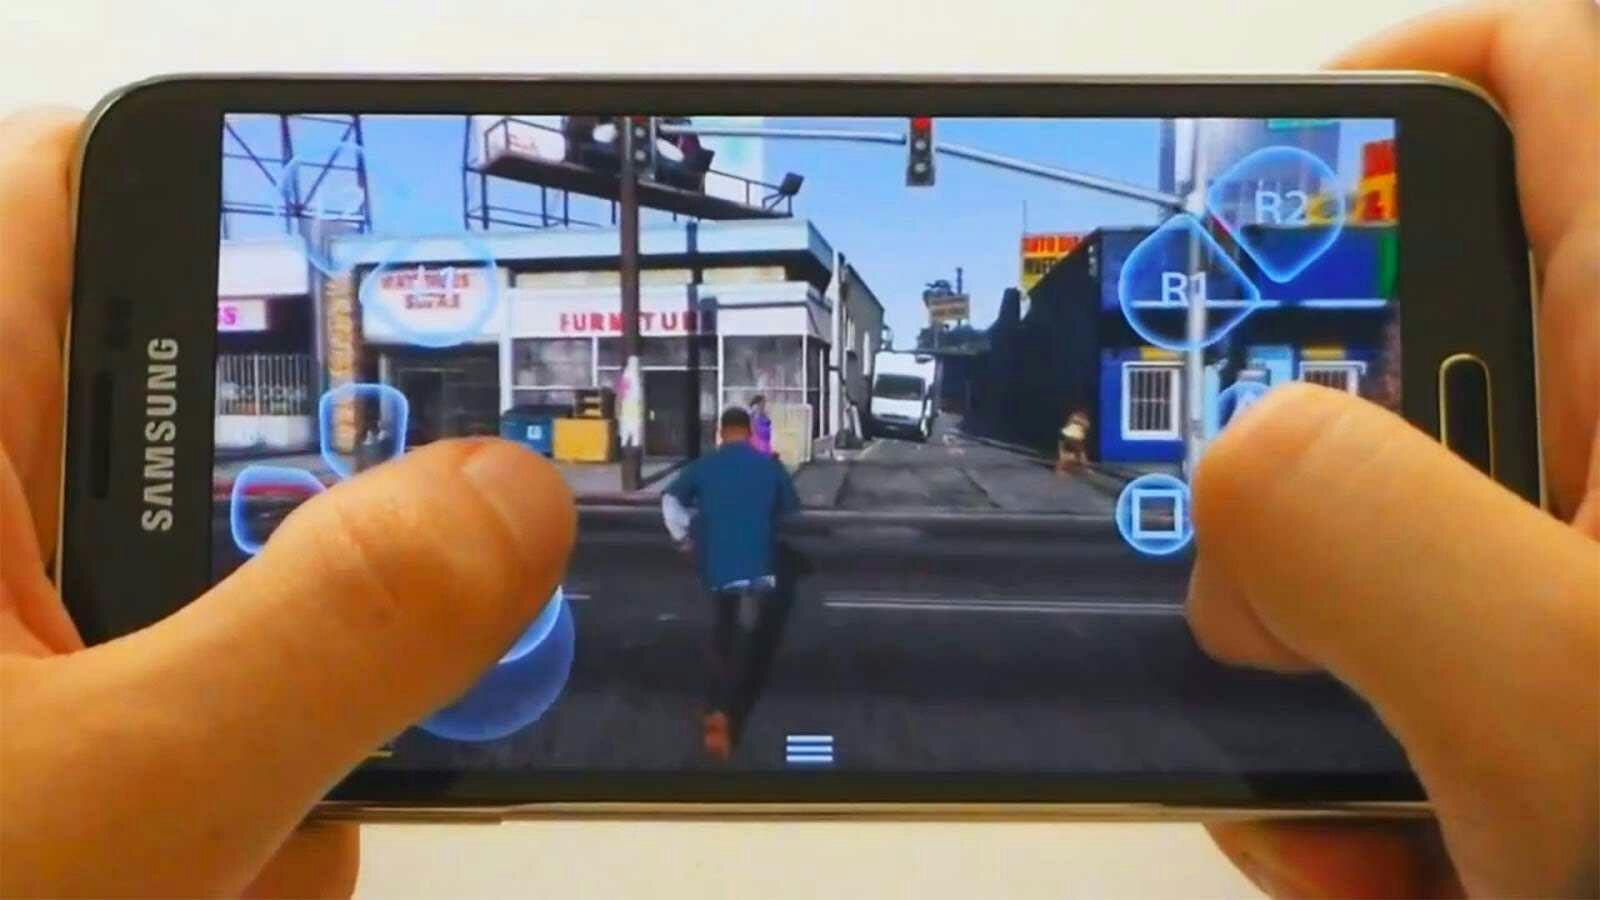 [GTA 5] আর নয় PC এখন আপনার ANDROID ফোনে খেলুন GTA 5 গেম৷